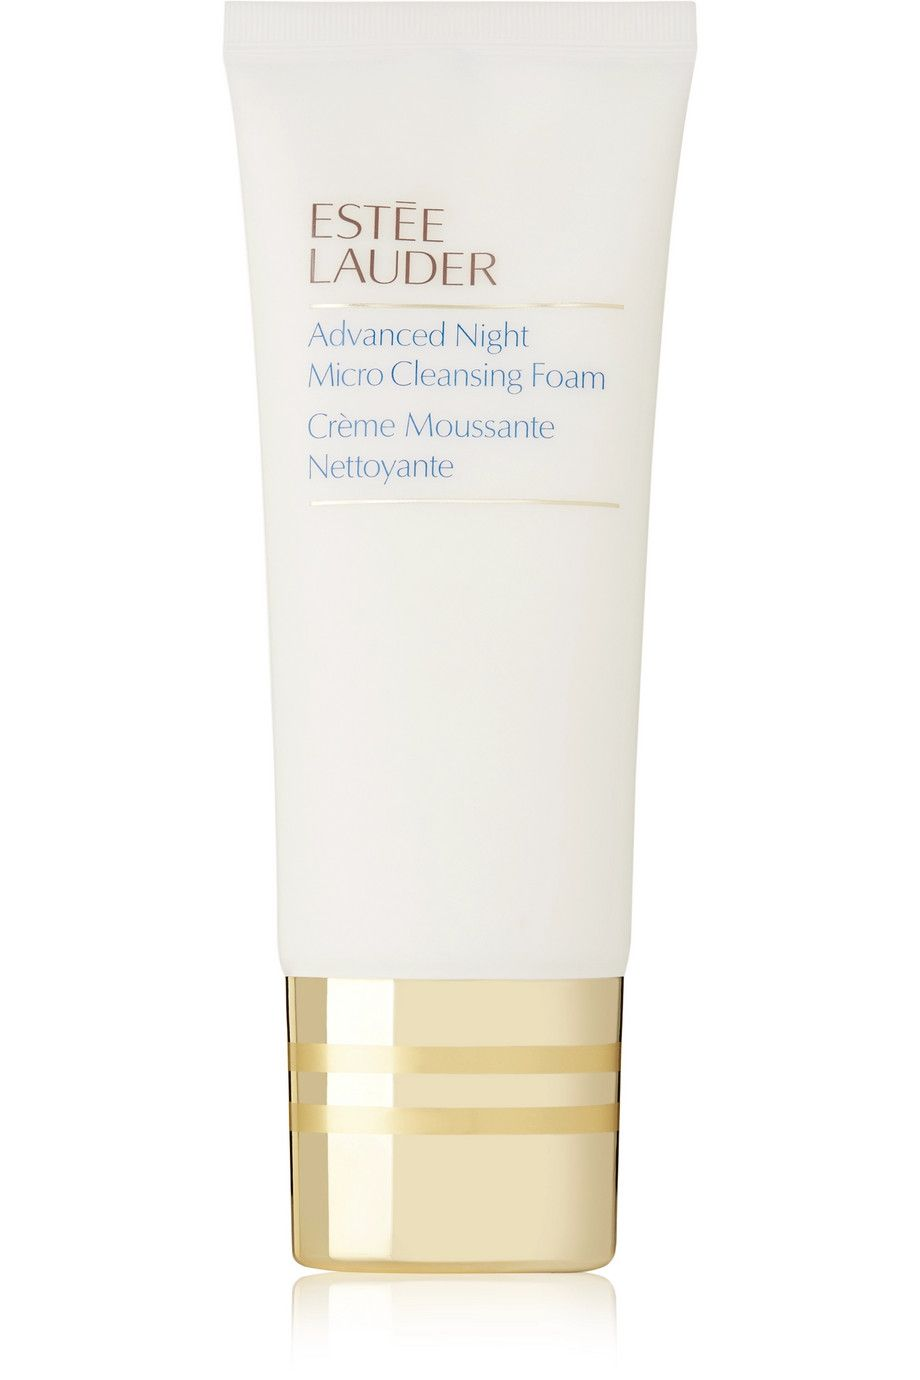 Advanced Night Micro Cleansing Balm by Estée Lauder #16